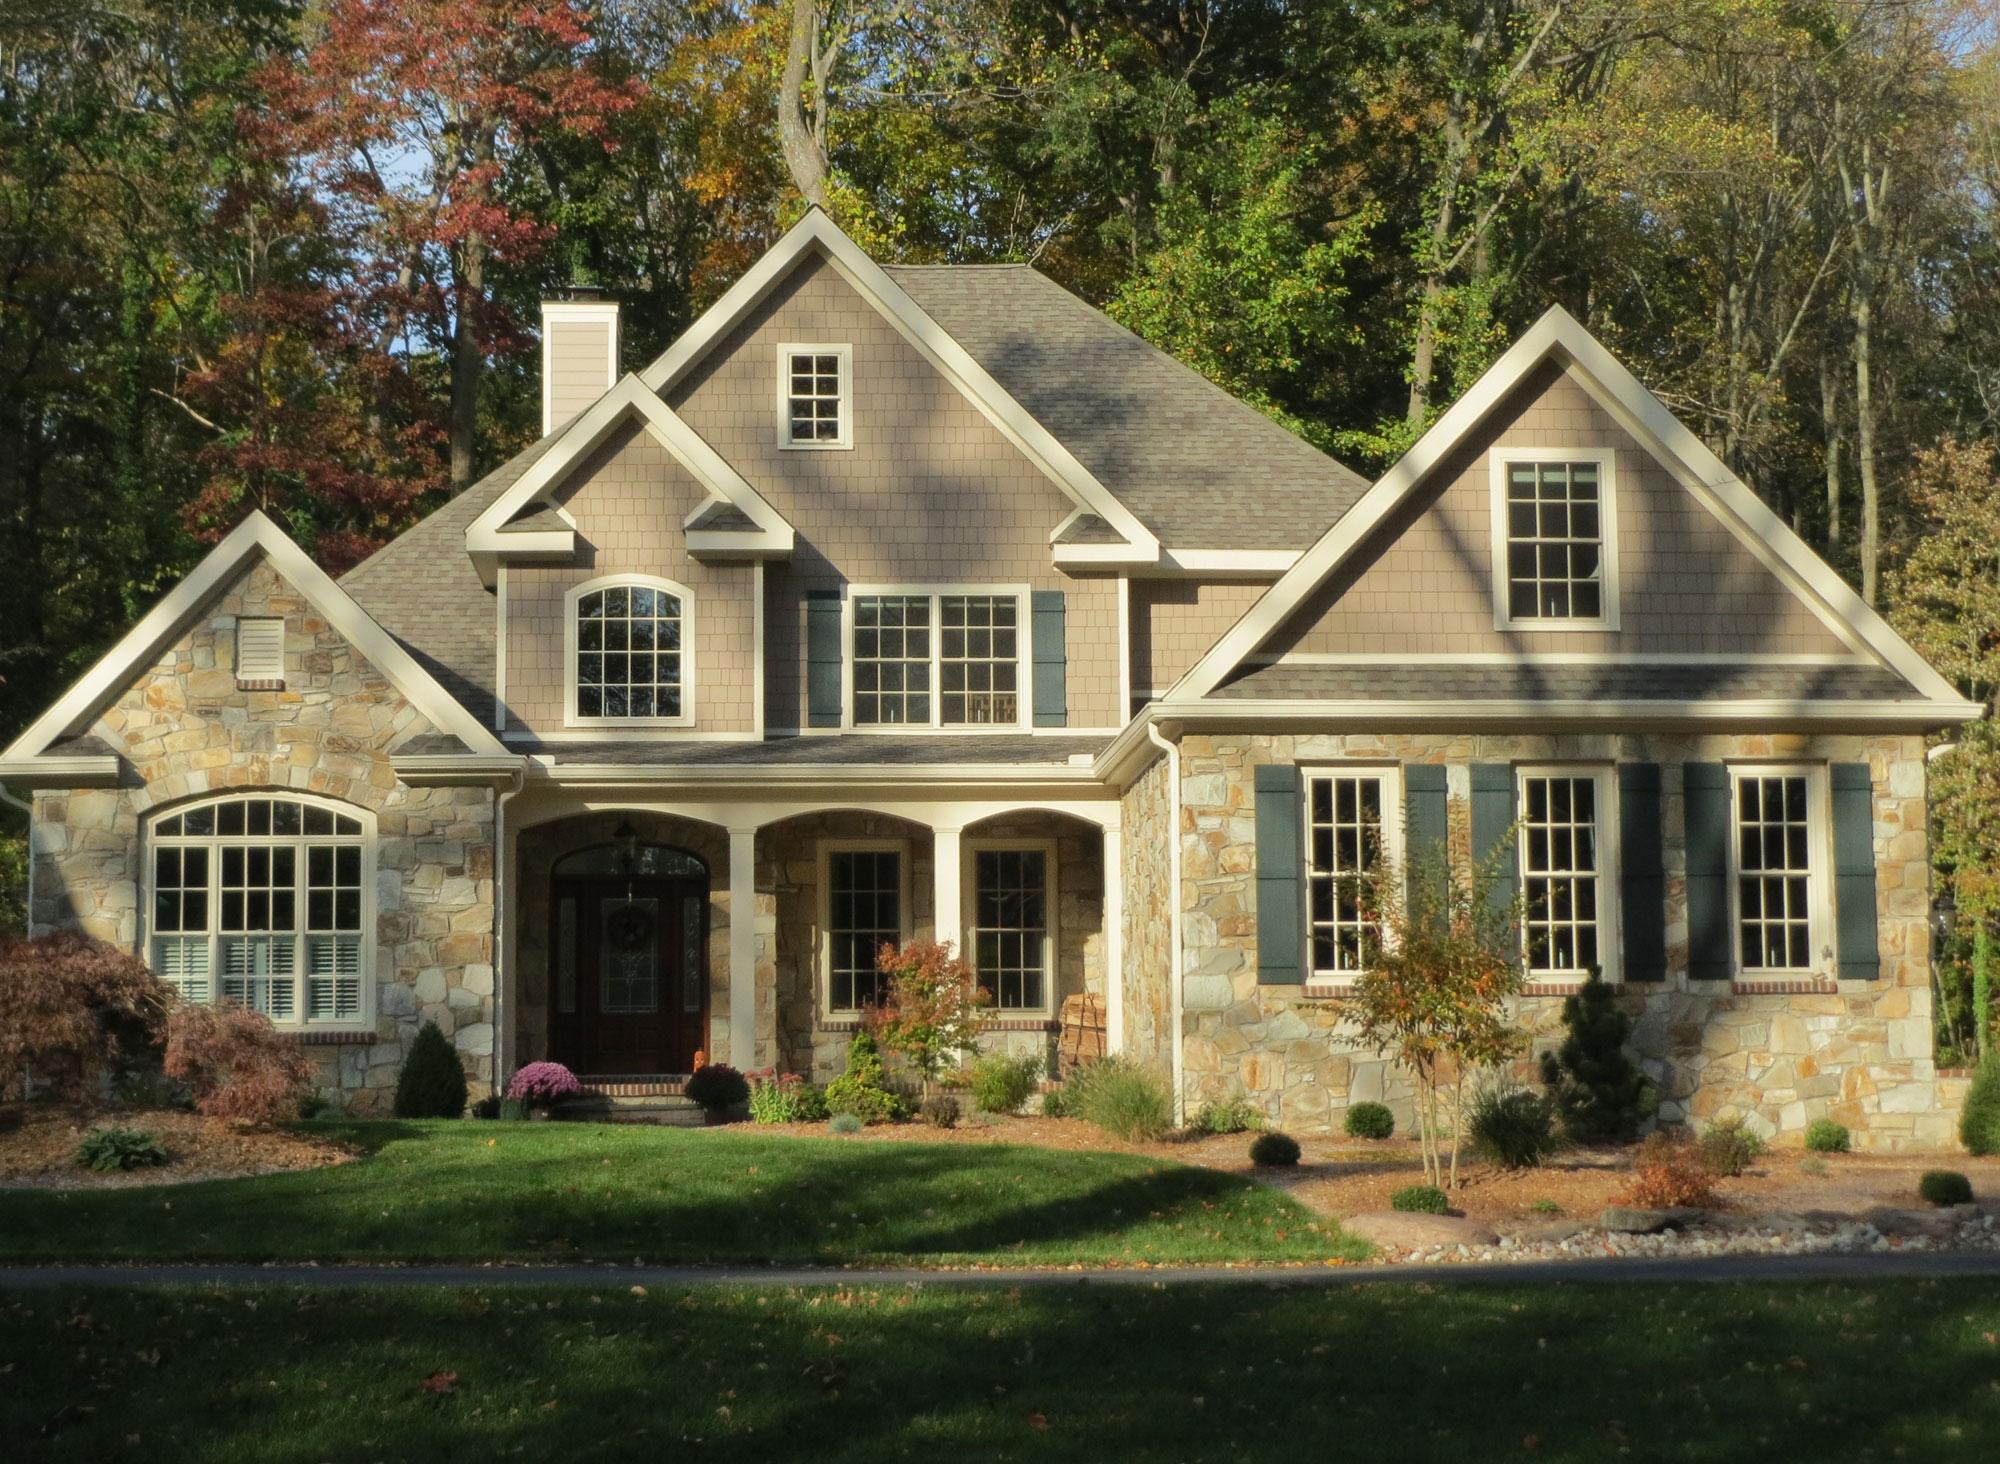 Terrific Delaware Custom Homes De Real Estate Market Largest Home Design Picture Inspirations Pitcheantrous